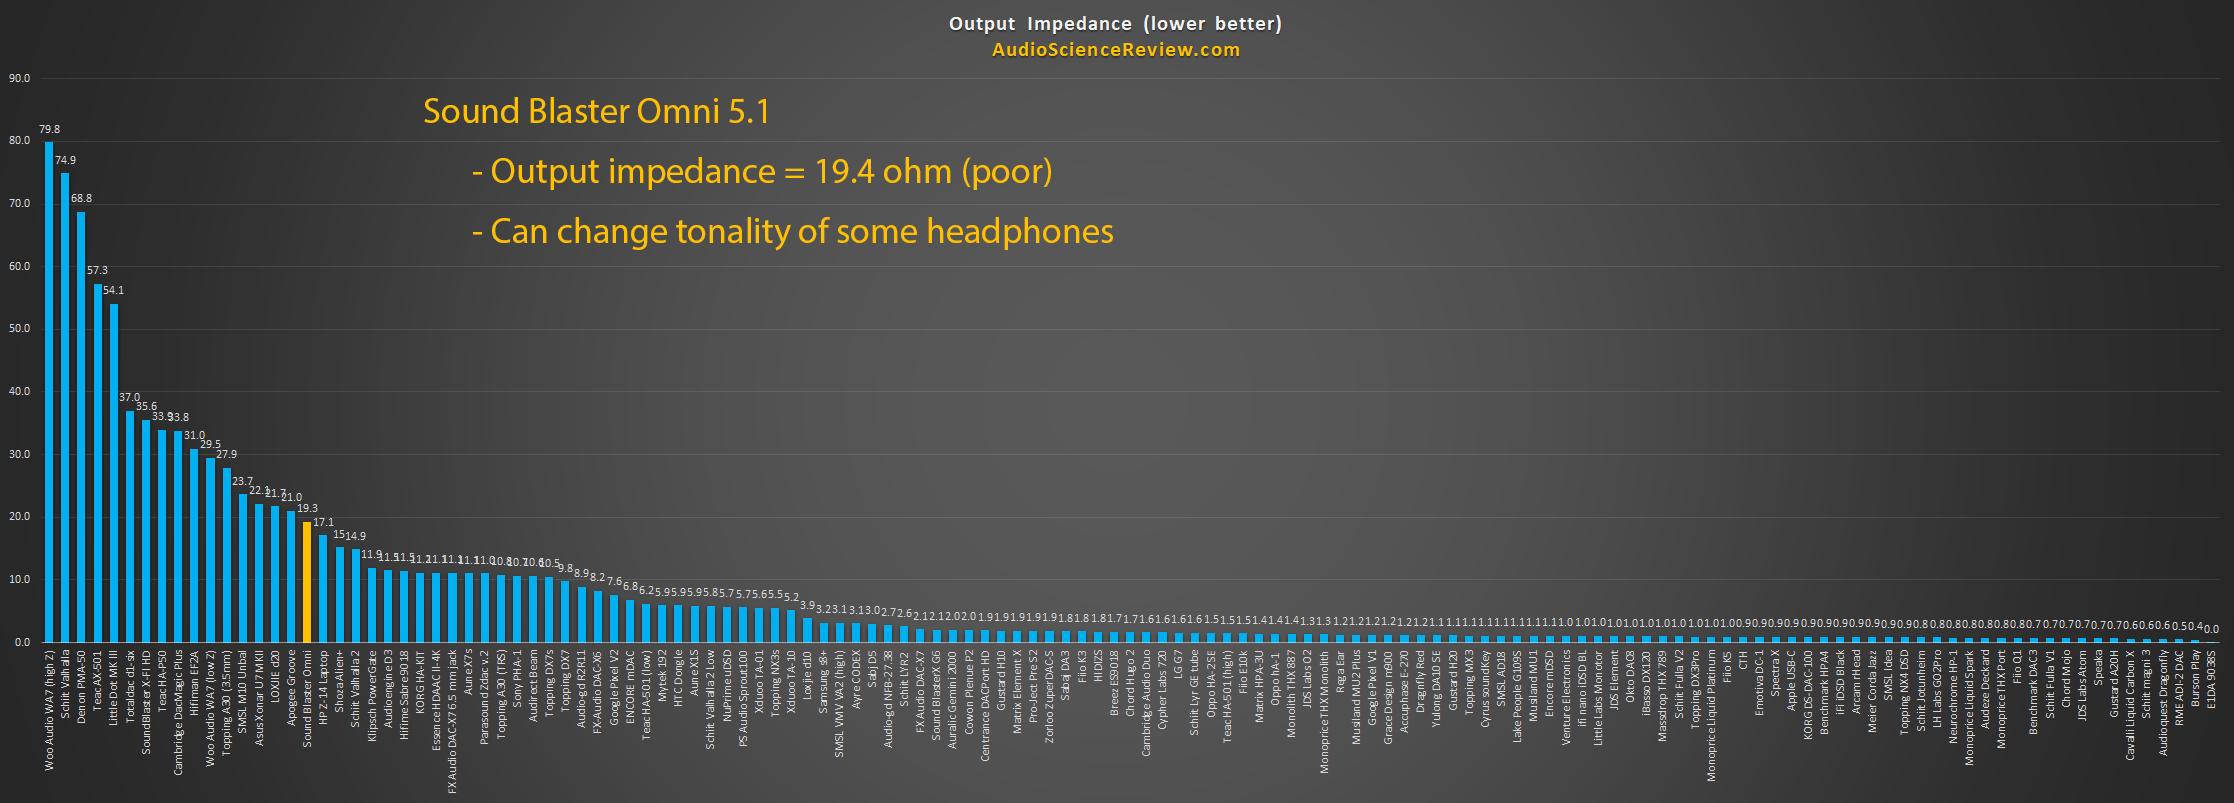 Best Headphone Amplifier Measurement Output Impedance.png